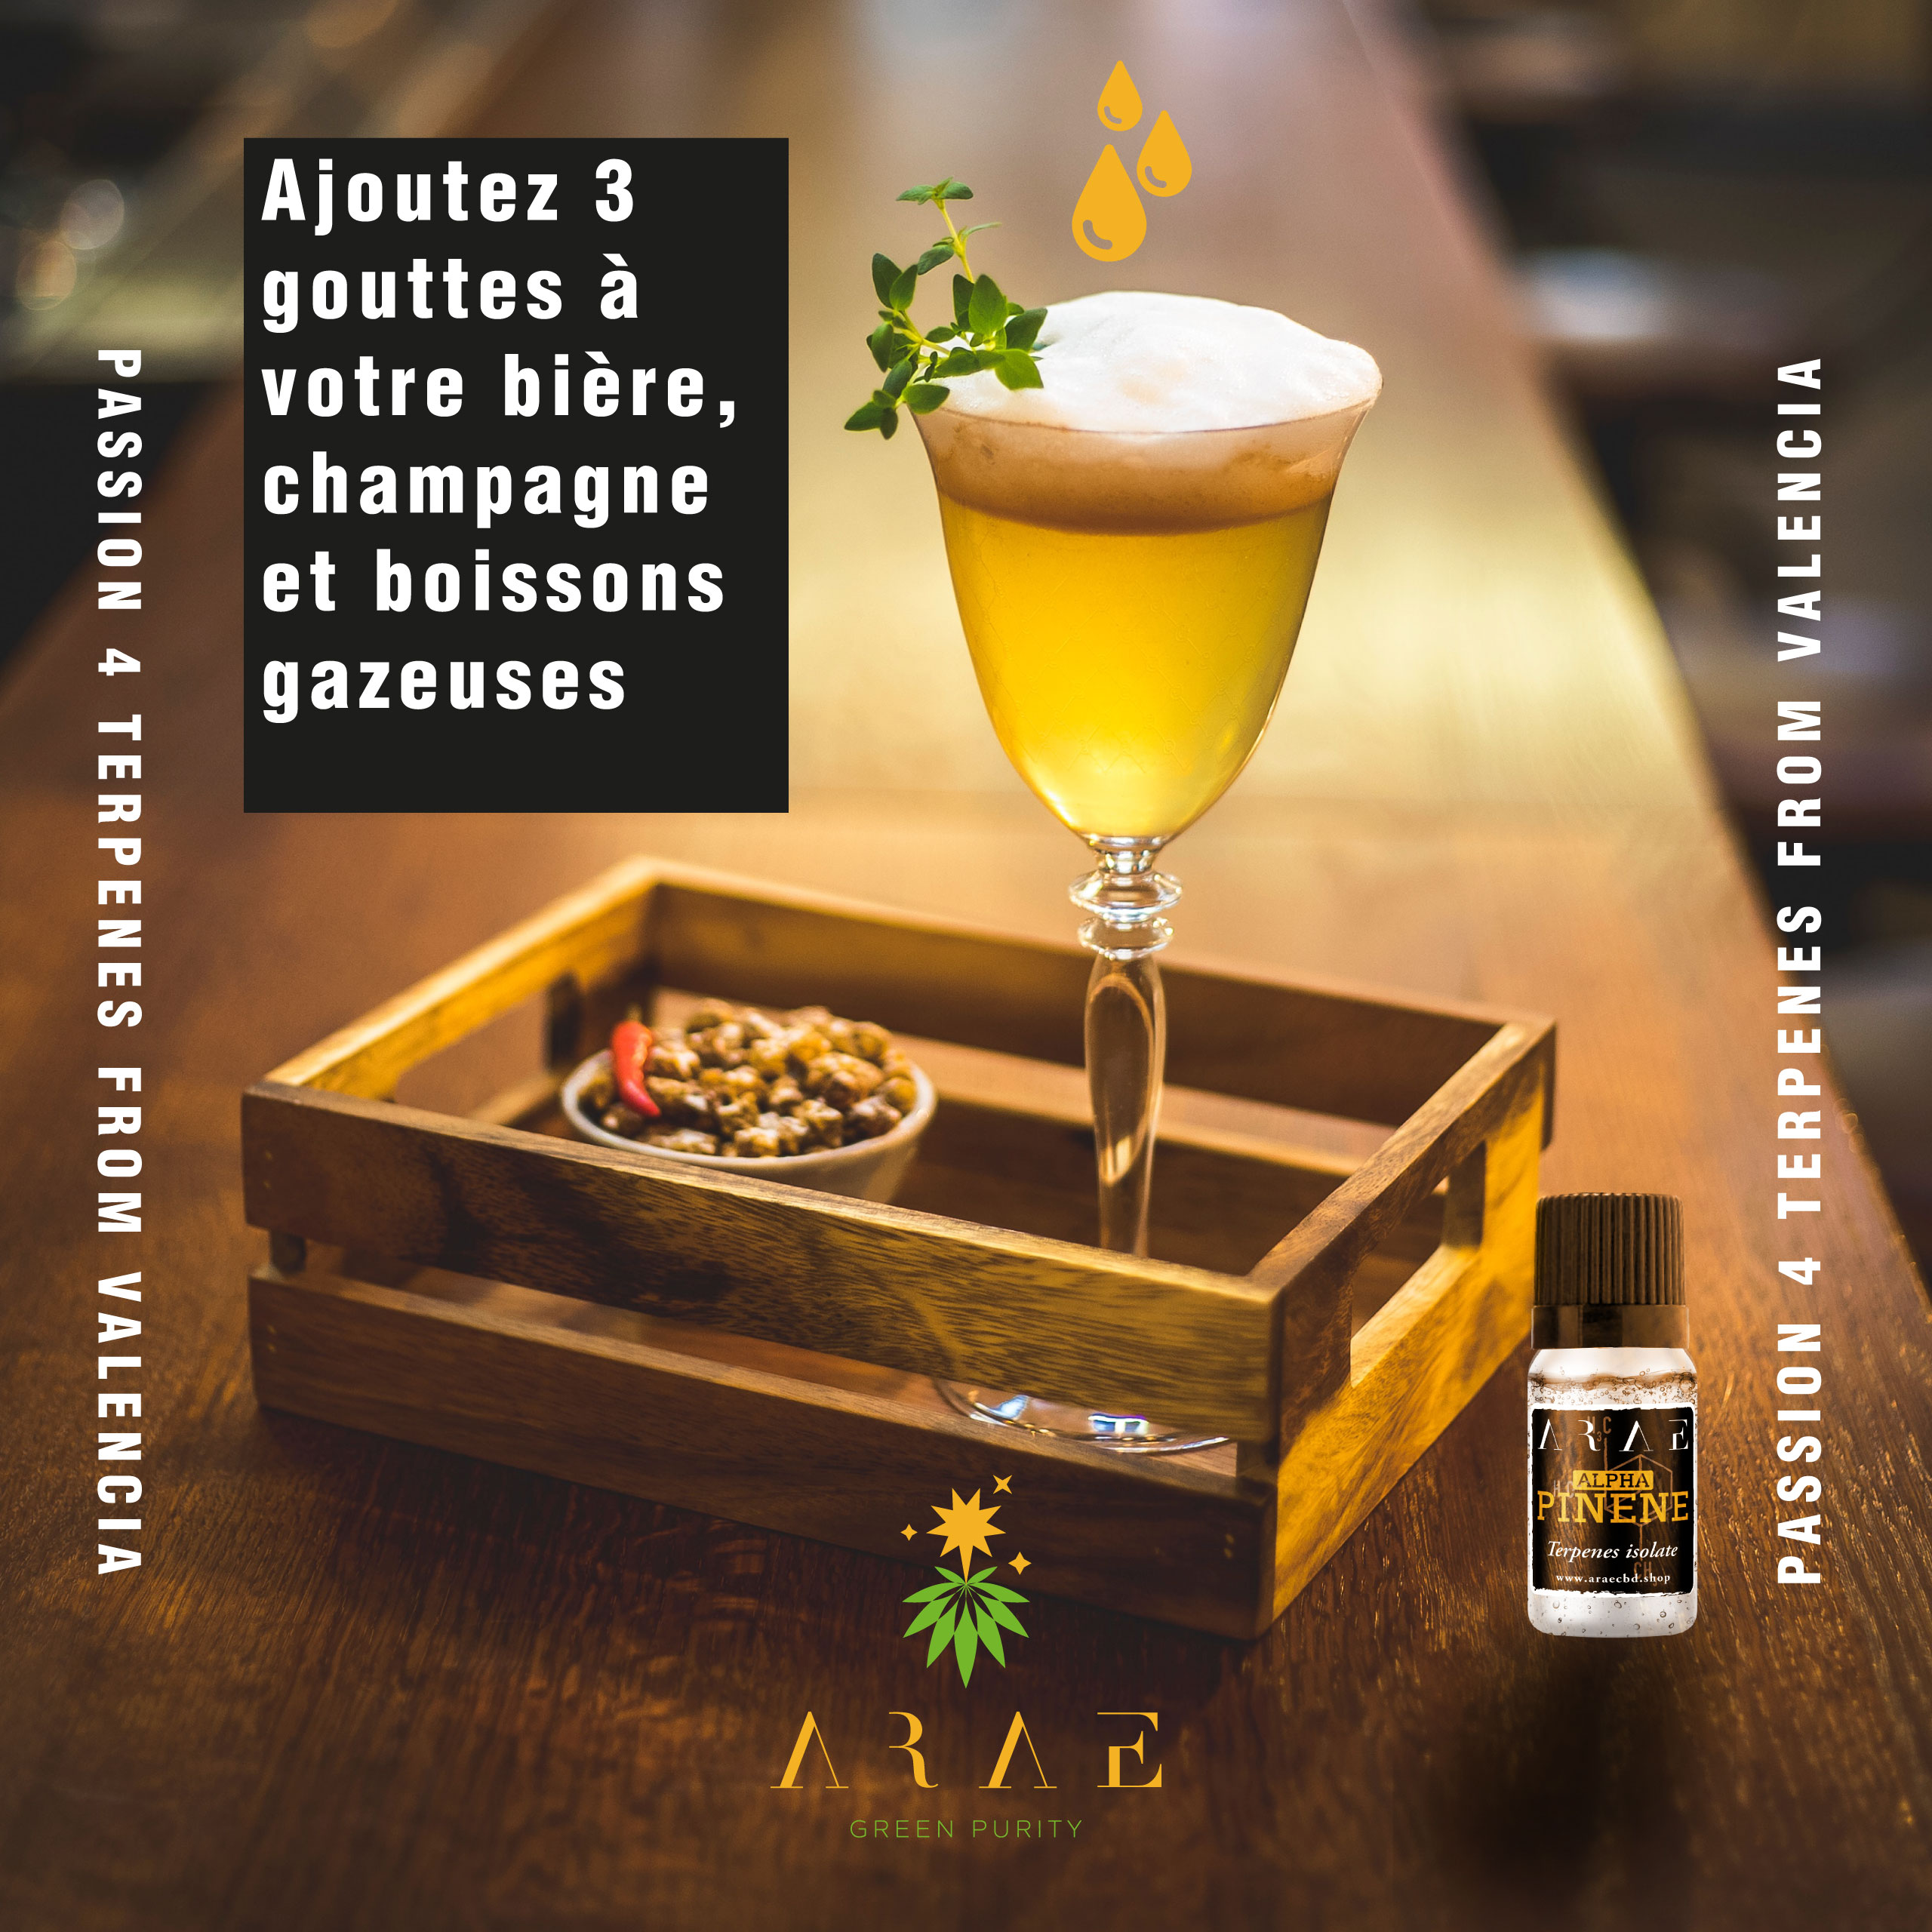 Alfa Pinene ARAE drinks